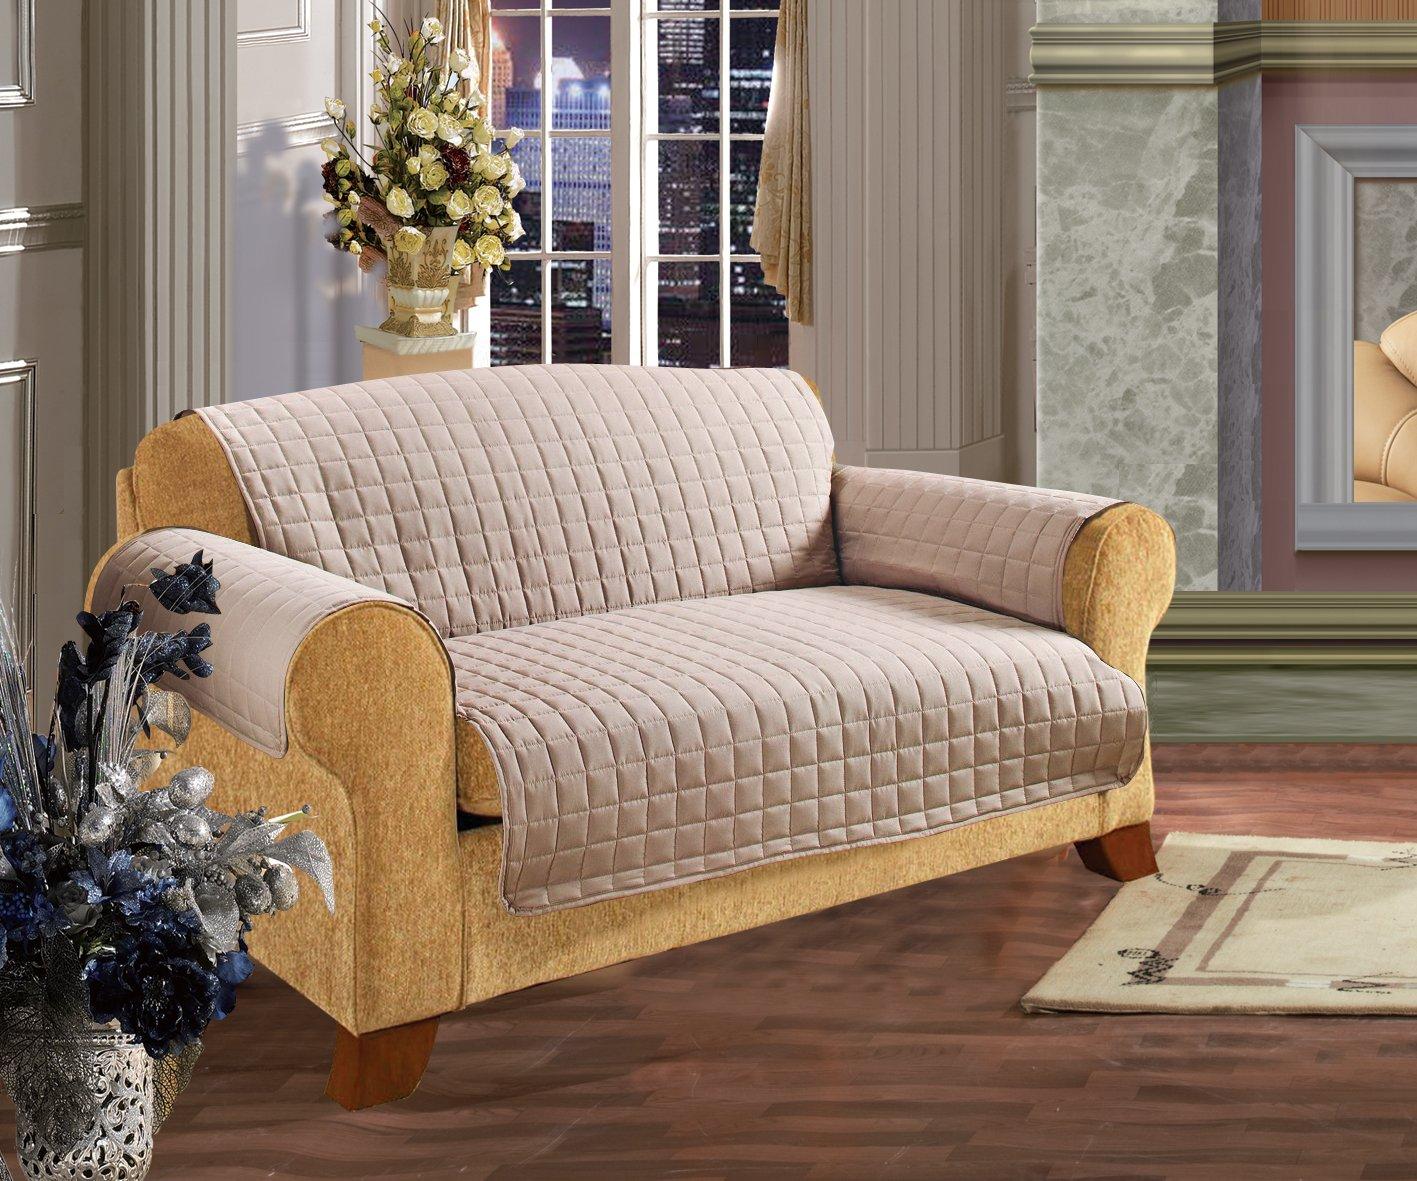 Elegance Linen Quilted Pet Dog Children Kids Furniture Protector Microfiber Slip Cover Sofa, Natural Natural Sofa1